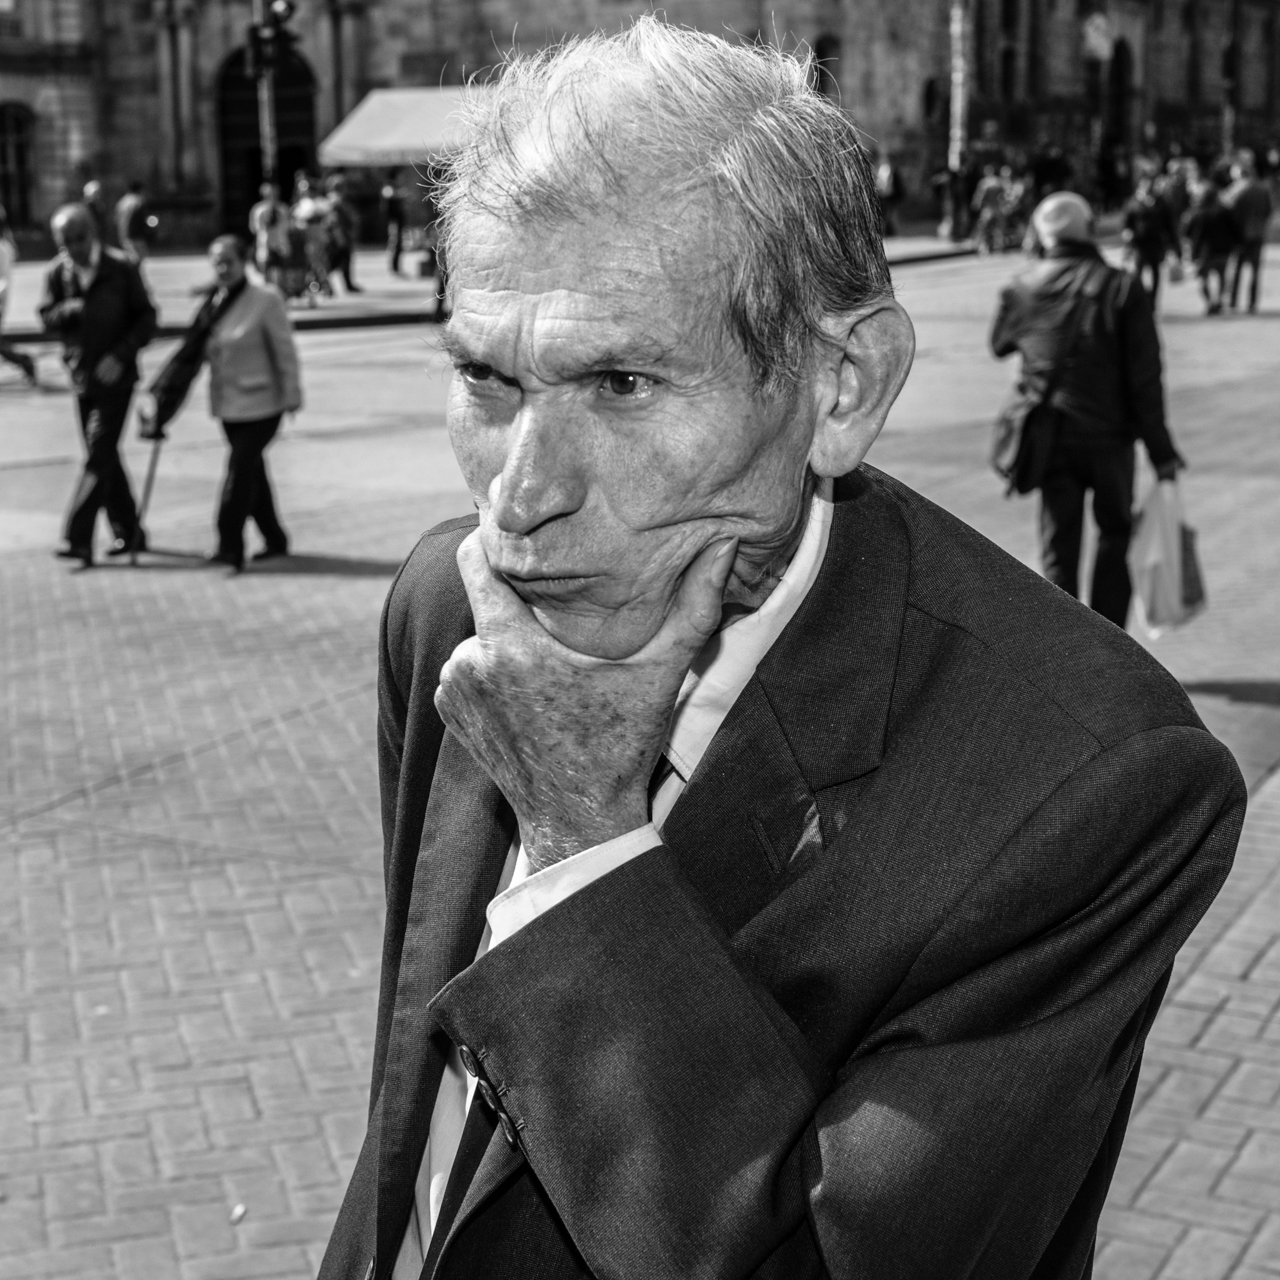 A businessman walks along the Avenue. July 6, 2015. (Juan Cristóbal Cobo)